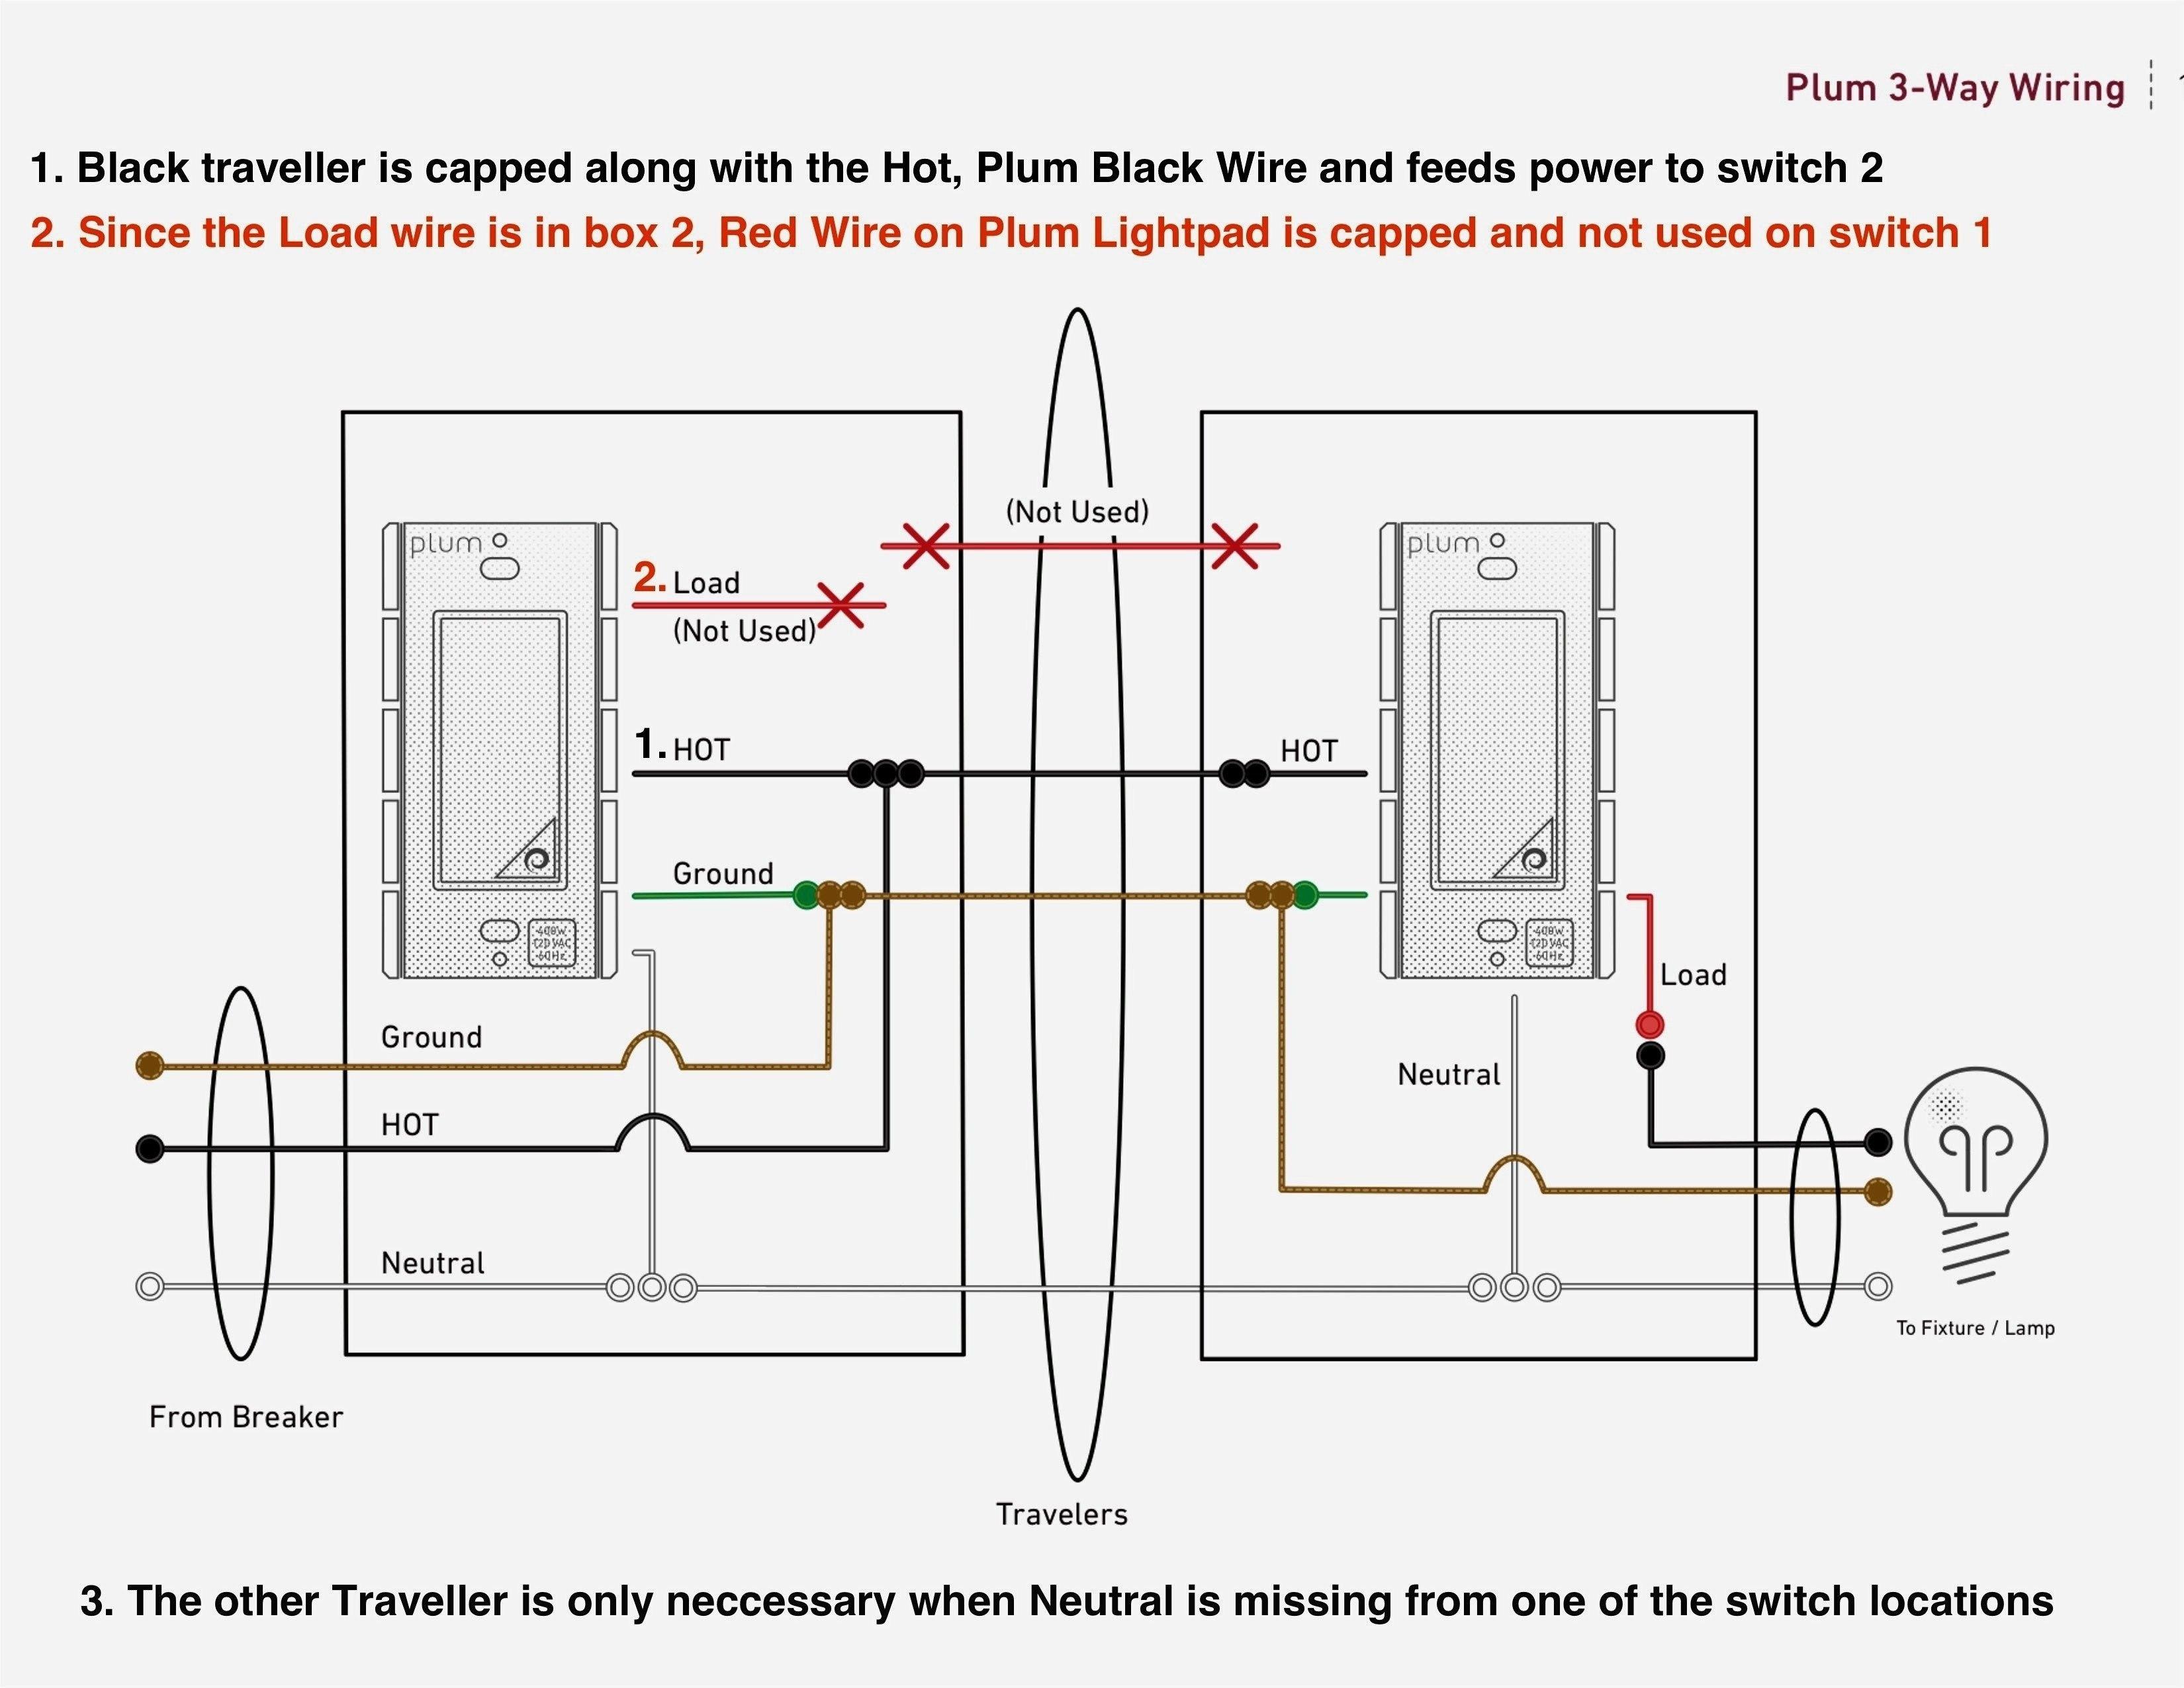 Leviton Switch Wiring Diagram 3 Way In 2020 Light Switch Wiring 3 Way Switch Wiring House Wiring